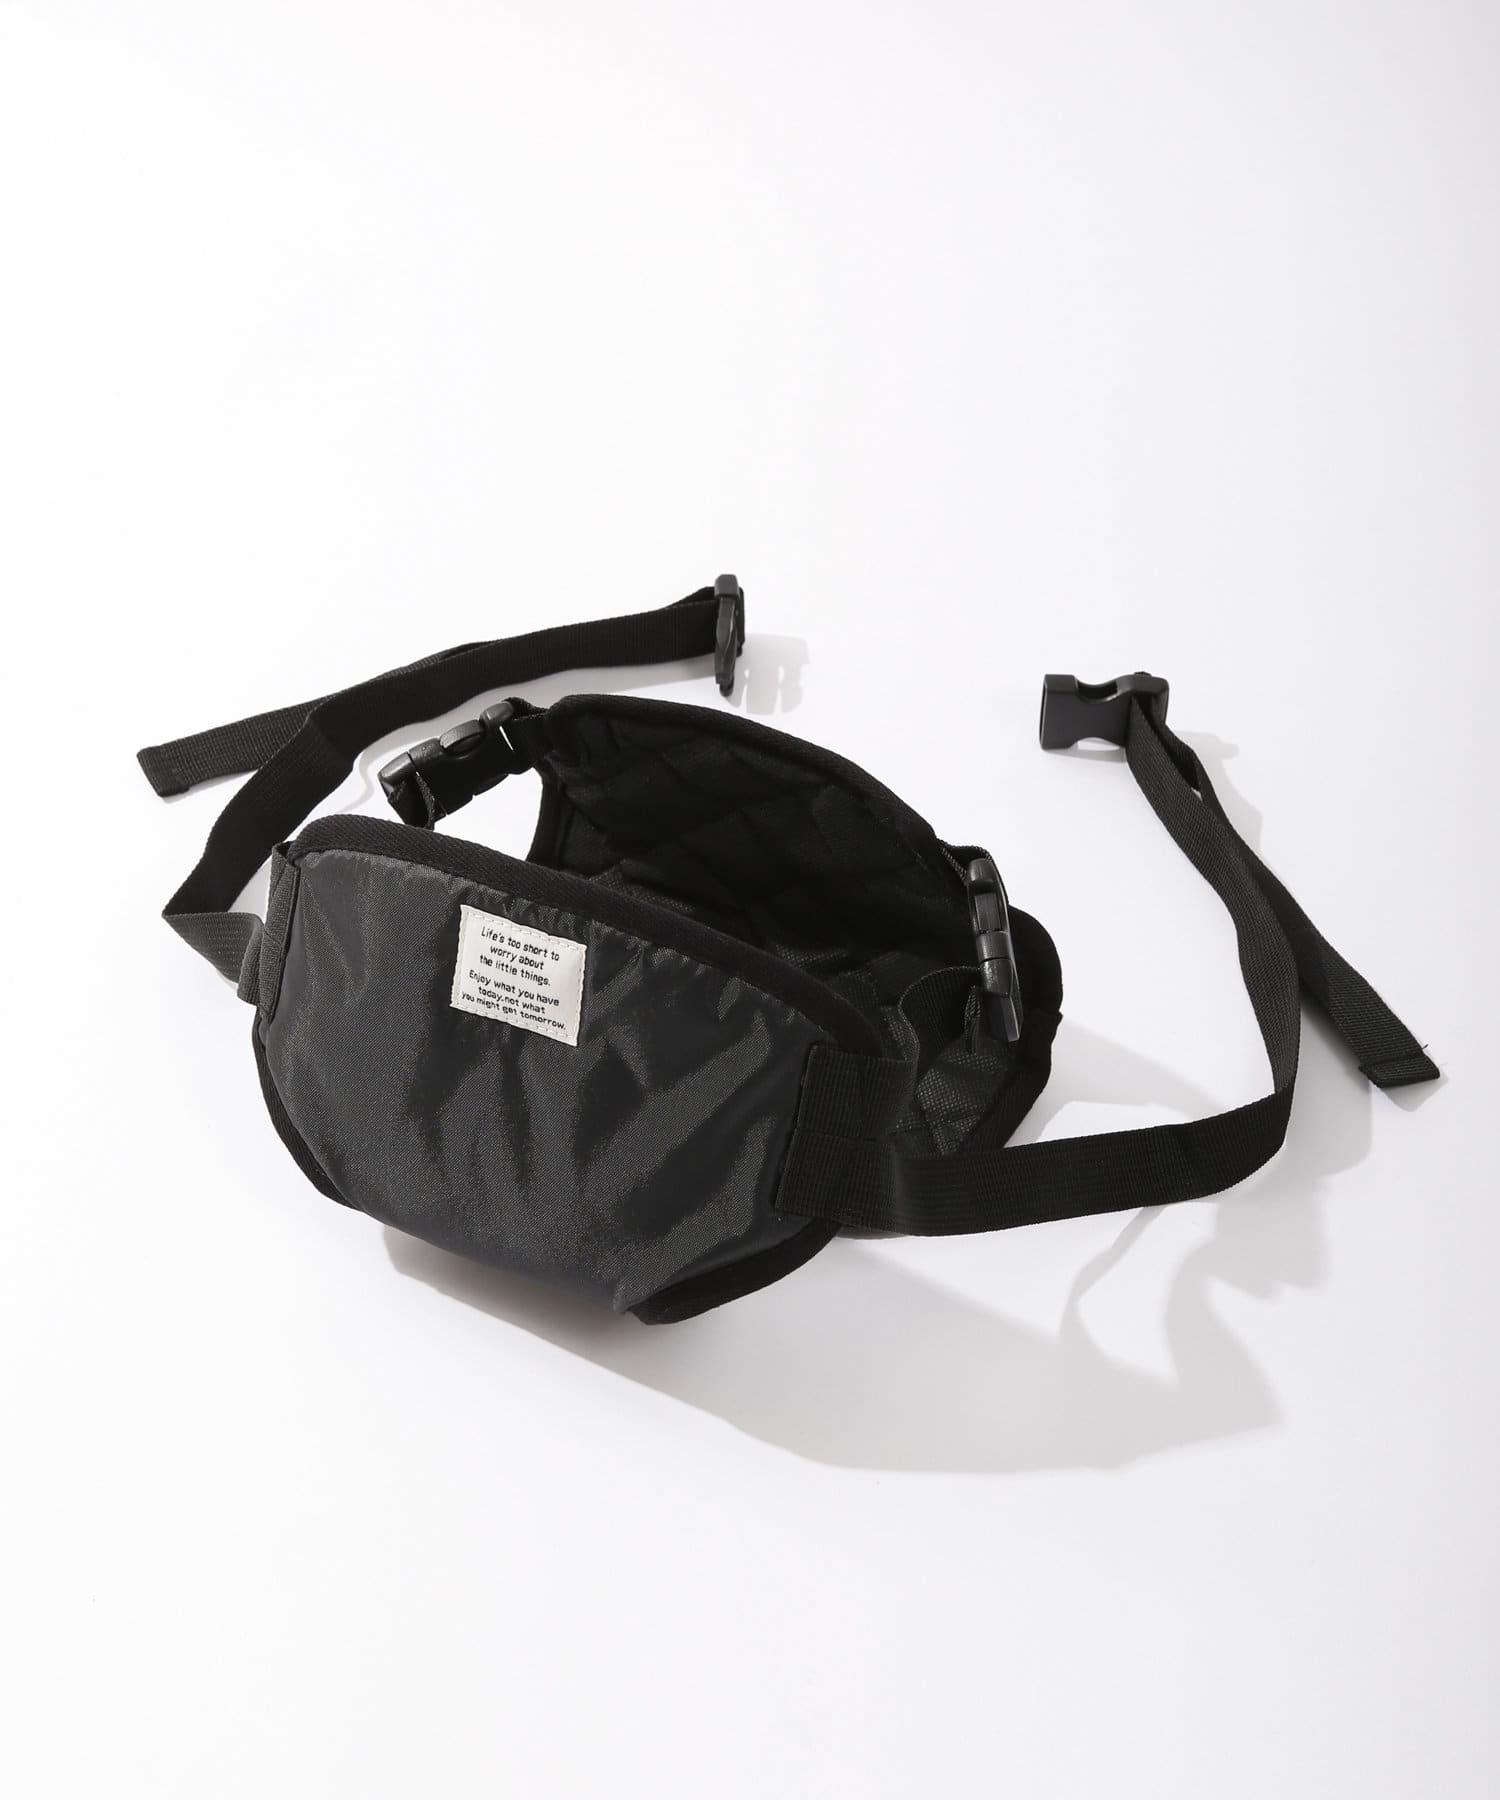 3COINS(スリーコインズ) ライフスタイル 【子育て便利グッズ】チェアベルト ブラック